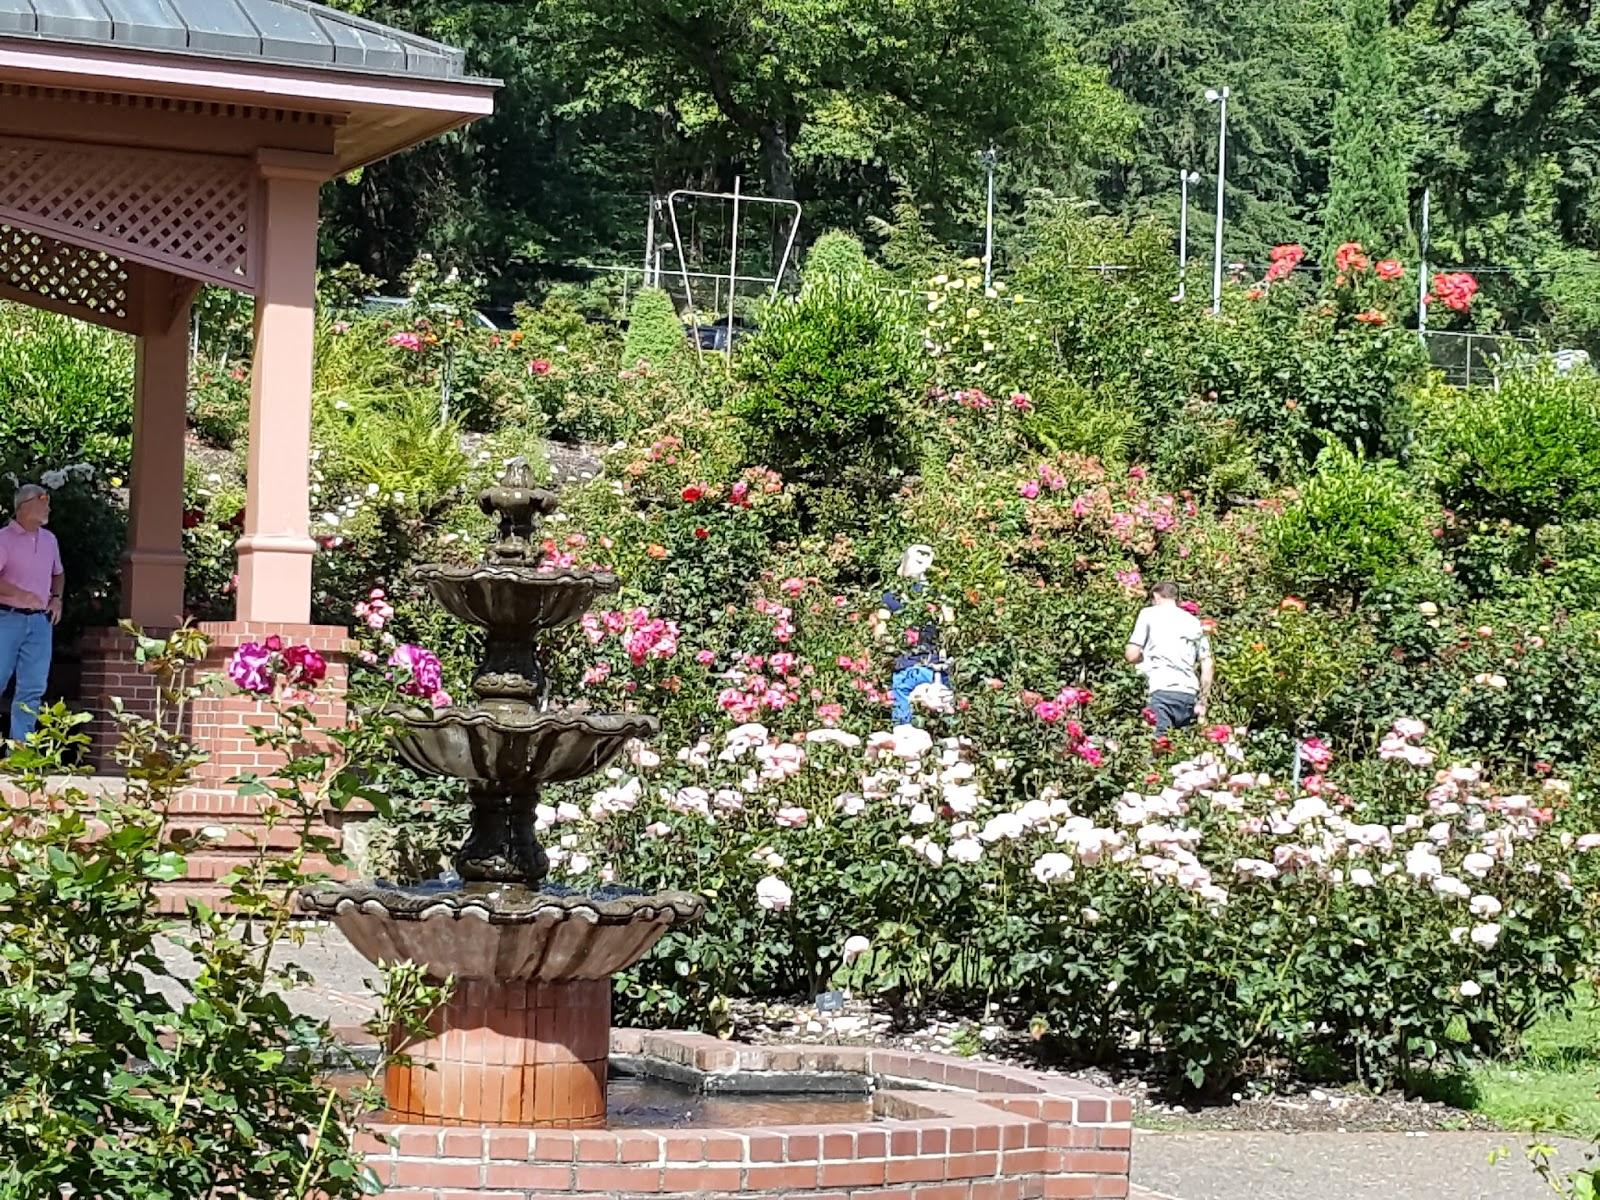 Plein Air Brooks Secret Rose painting at Rose Test Garden